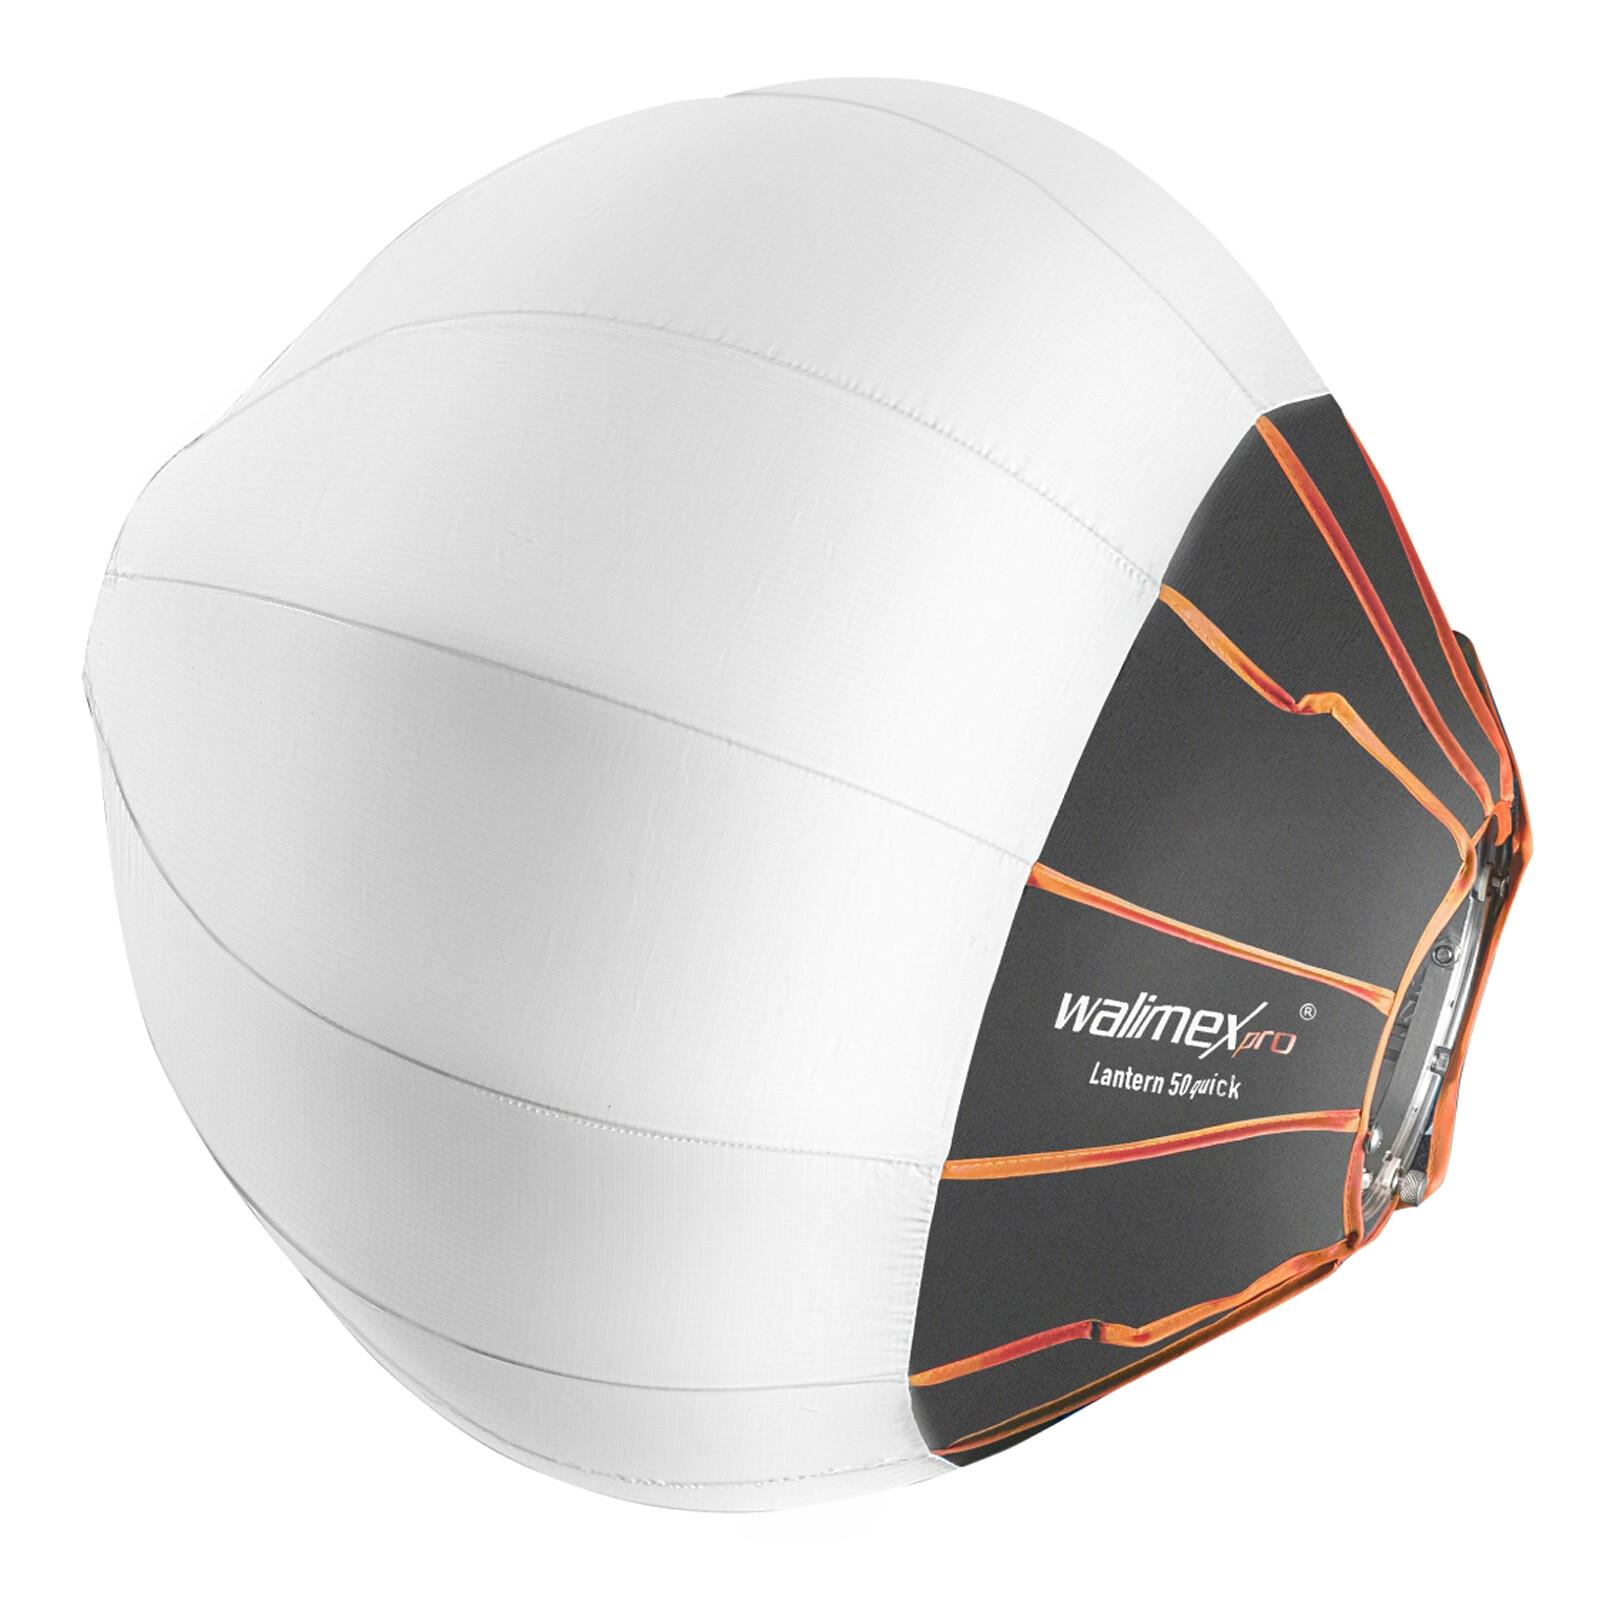 Walimex pro 360° Ambient Light Softbox 50cm Multiblitz P